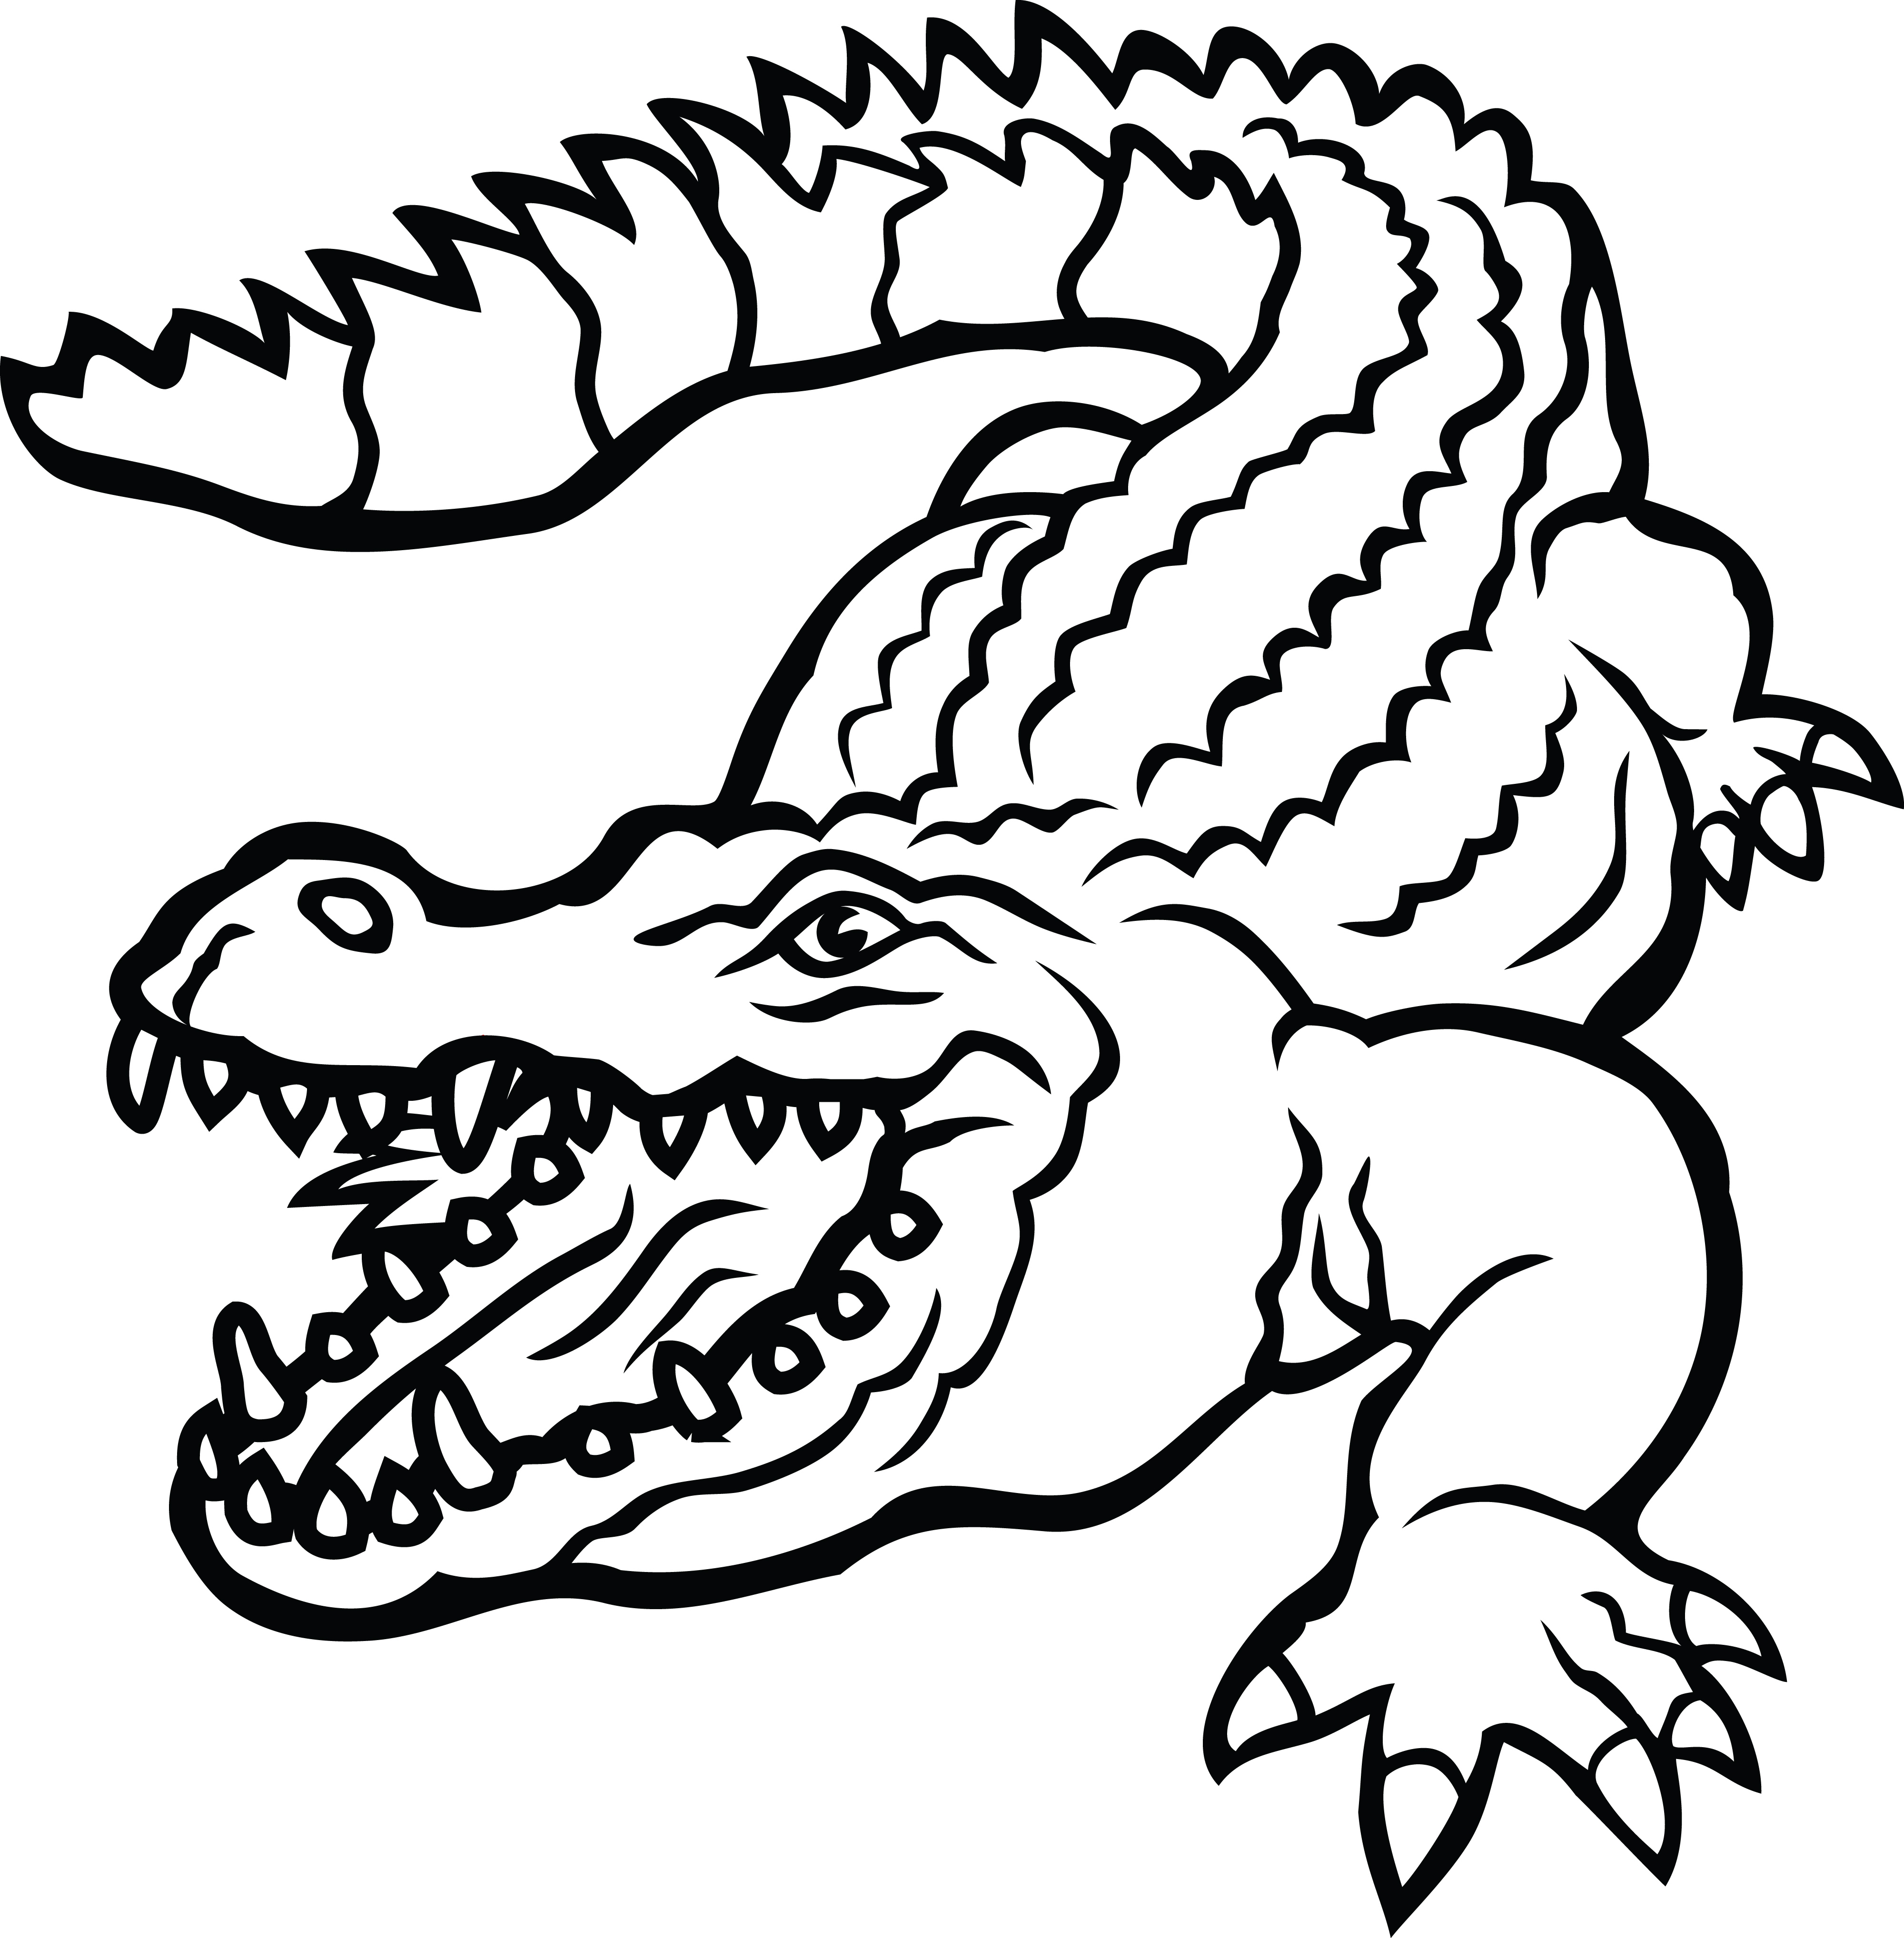 4000x4072 Clipart Of A Crocodile